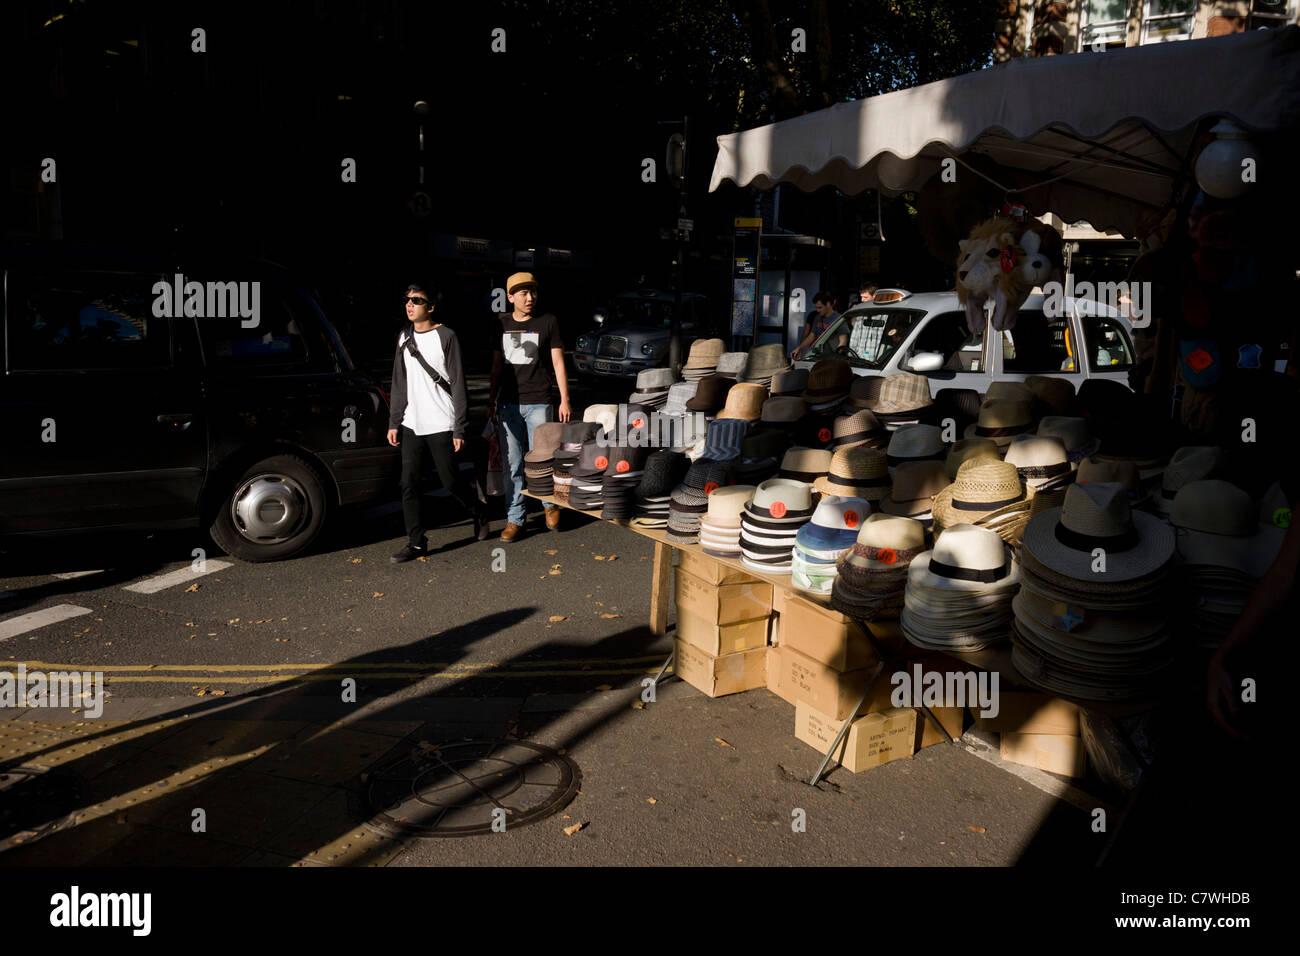 Hats Baseball Stock Photos   Hats Baseball Stock Images - Page 17 ... 1cca6e13fa12